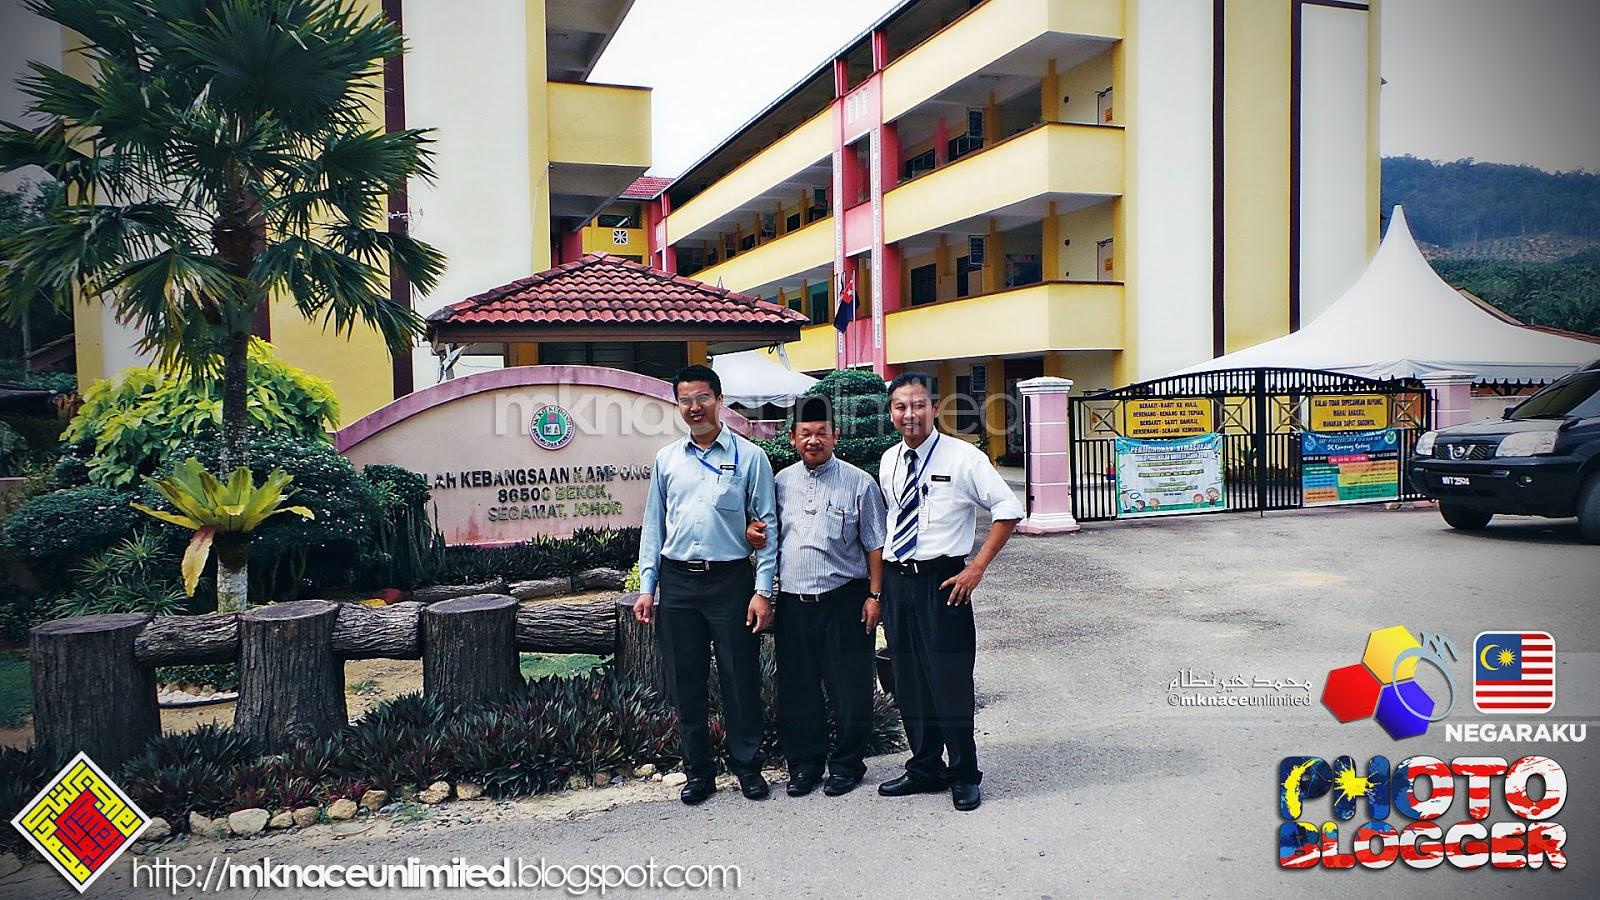 SK Kampong Kudung   Site Verification. Semalam ke SK Kampong Kudung.  Kampung orang asli di daerah Segamat. Sebenarnya banyak yang aku nak tulis. 55fd86c577